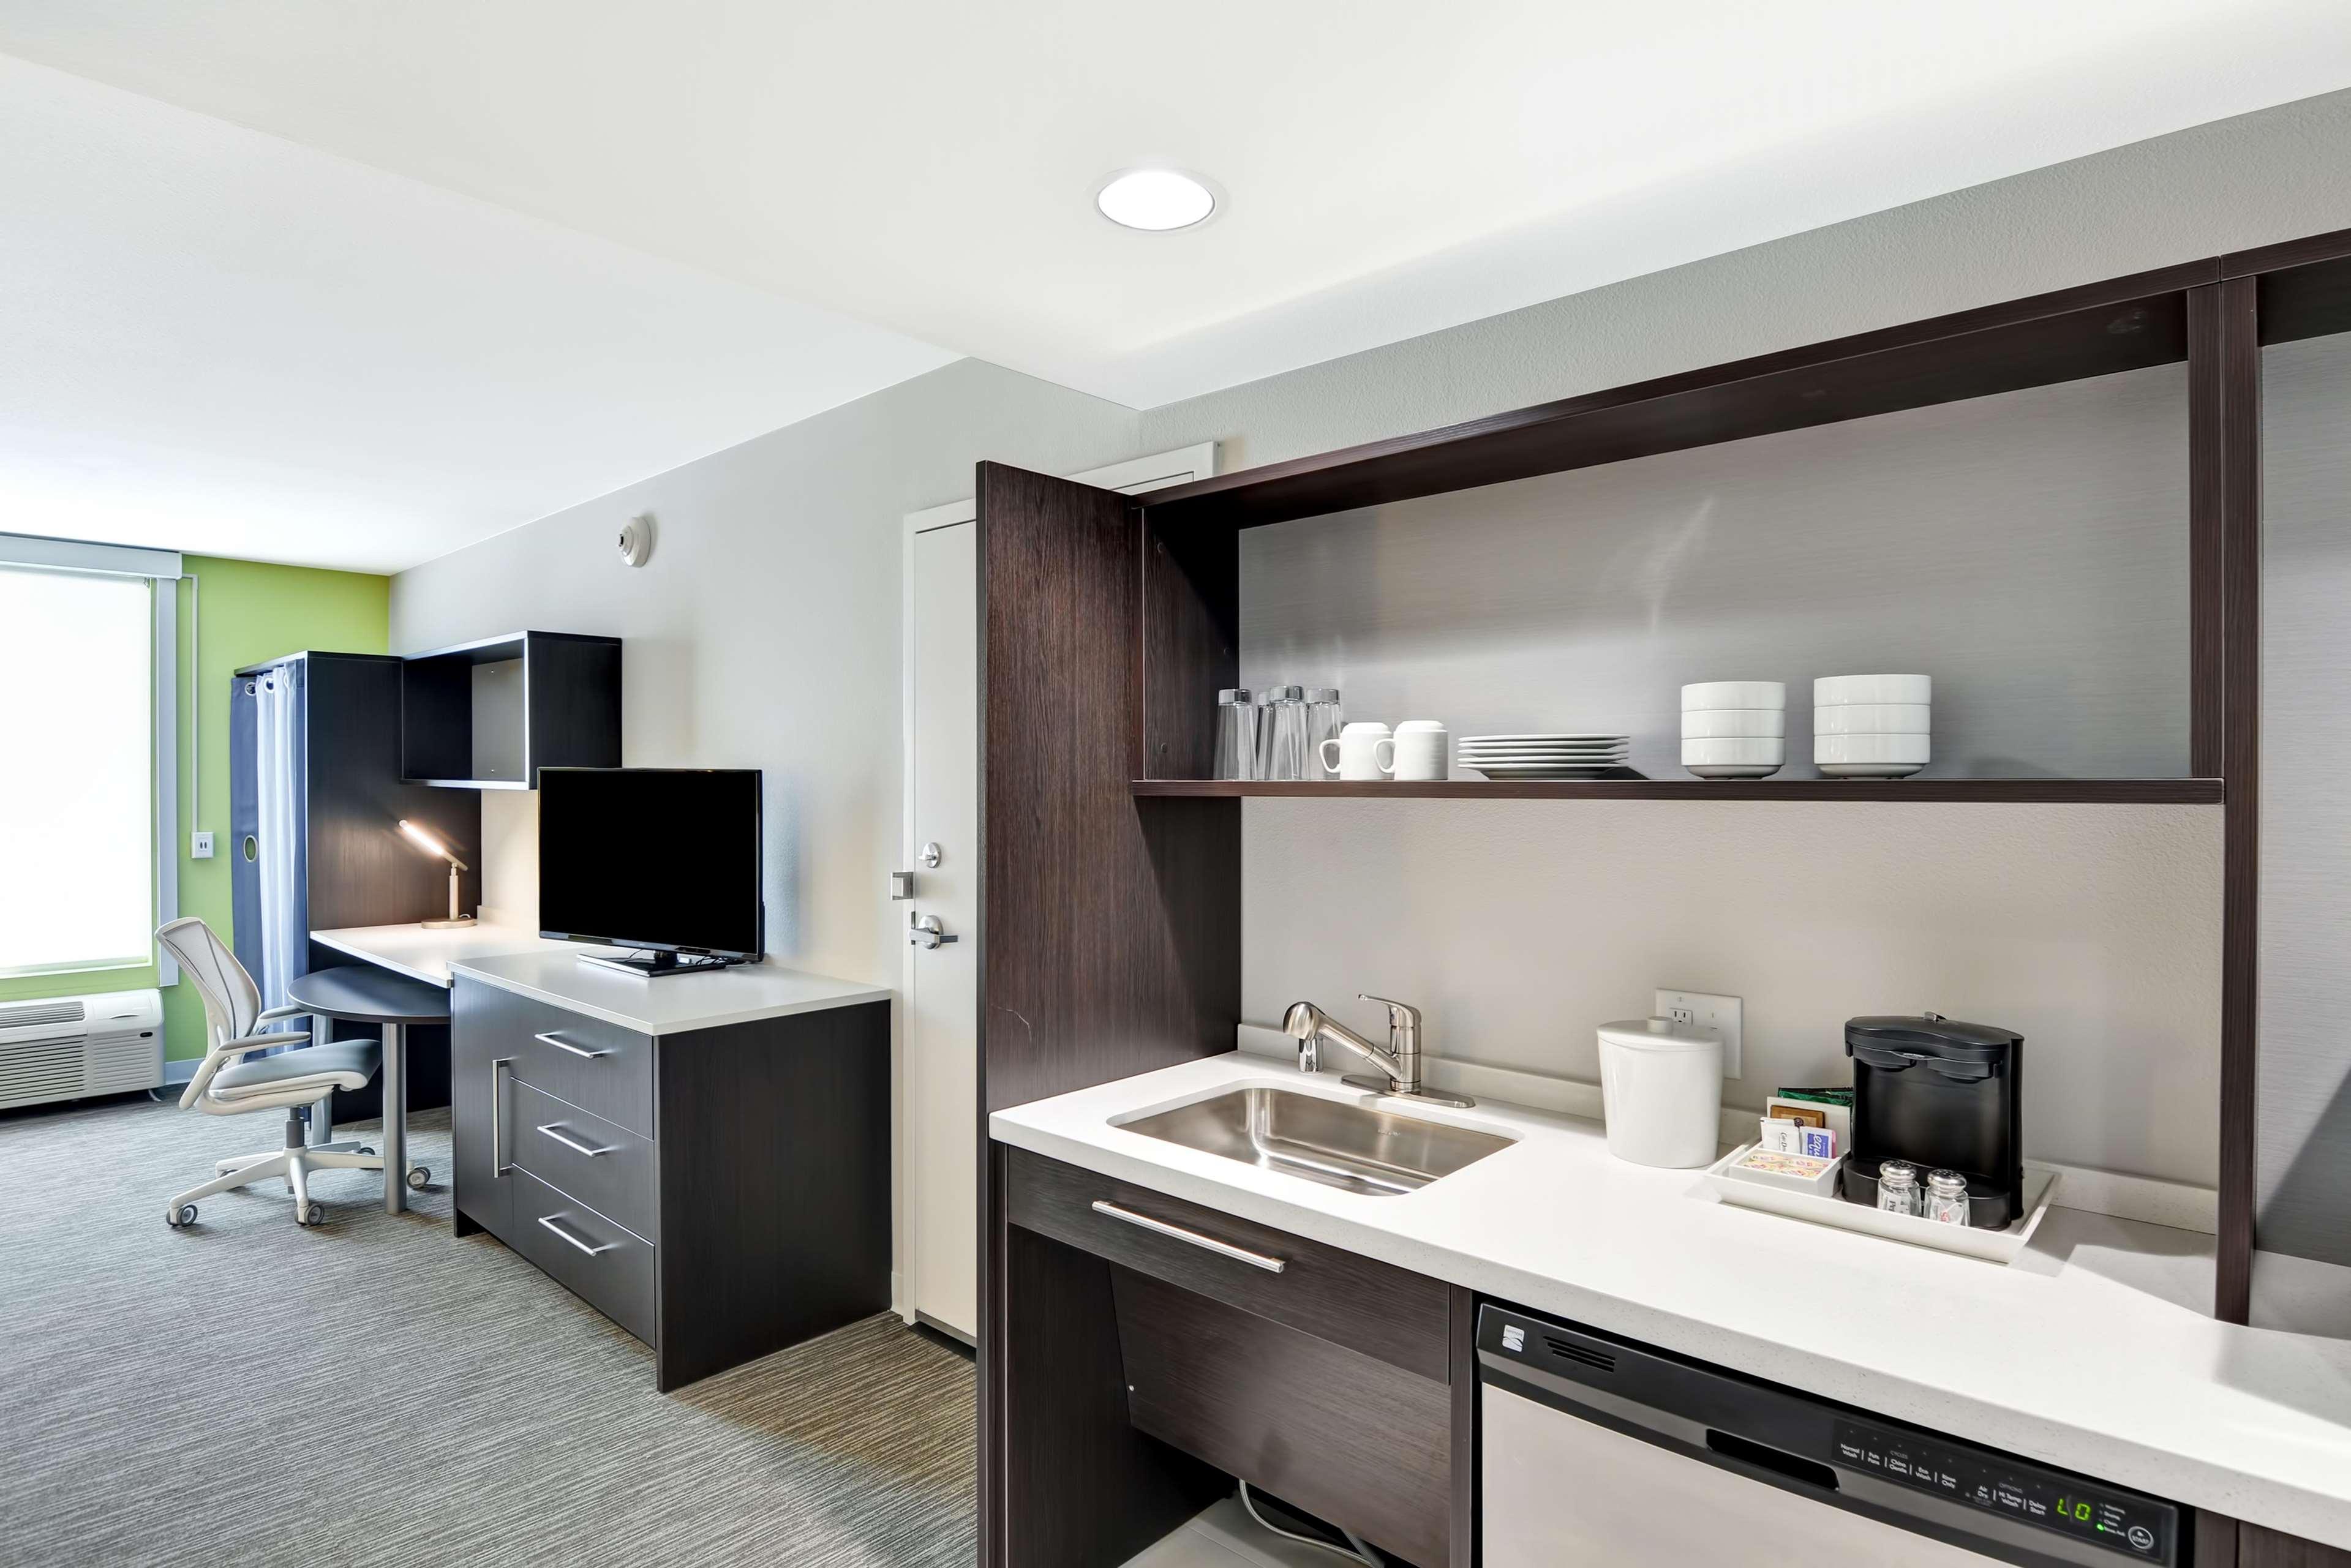 Home2 Suites by Hilton Azusa image 20